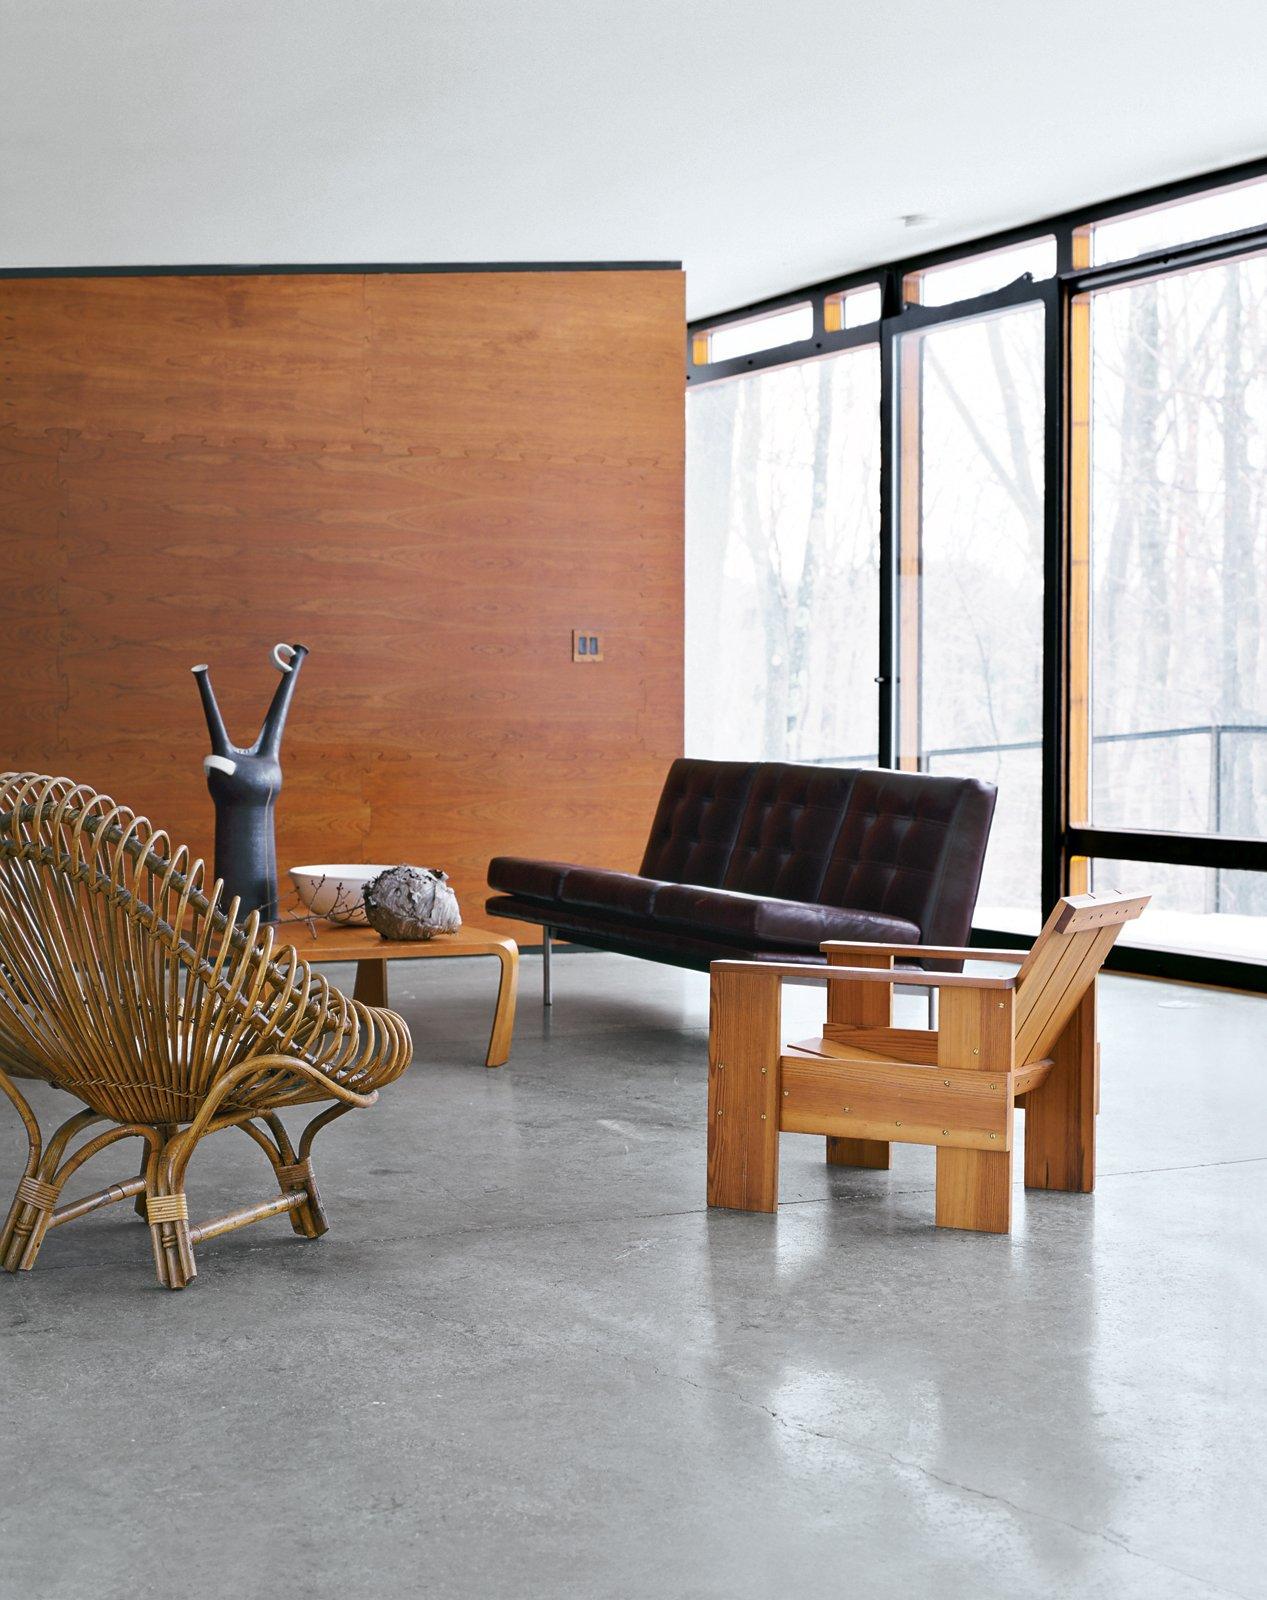 #seatingdesign #seating #modern #interior #inside #indoor #wood #concrete #industrial #window #light #sculpture #WilliamMassie #hybridprefab #prefab #GregWooten #FracoAlbini #RattanChair #CrateChair #GerritRietveld #EdwardAxelRoffman #sofa #BrunoGambone #ceramic   Photo courtesy of Karina Tengberg   100+ Best Modern Seating Designs